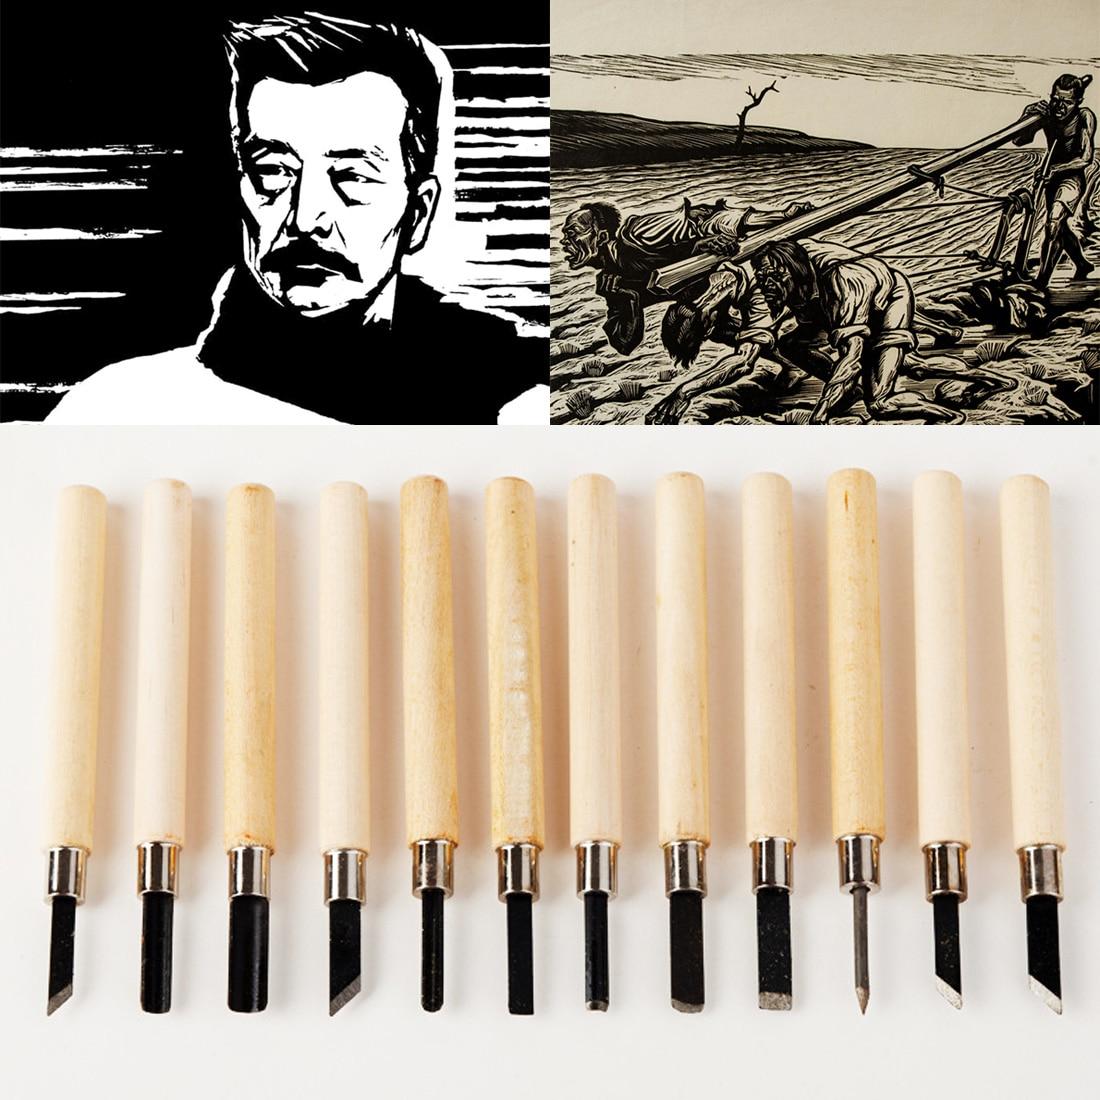 DIY Pen Woodcut Knife Scarper Wood Carving Tools 10pcs/12pcs Woodworking Hobby Arts Crafts Nicking Cutter Graver Scalpel